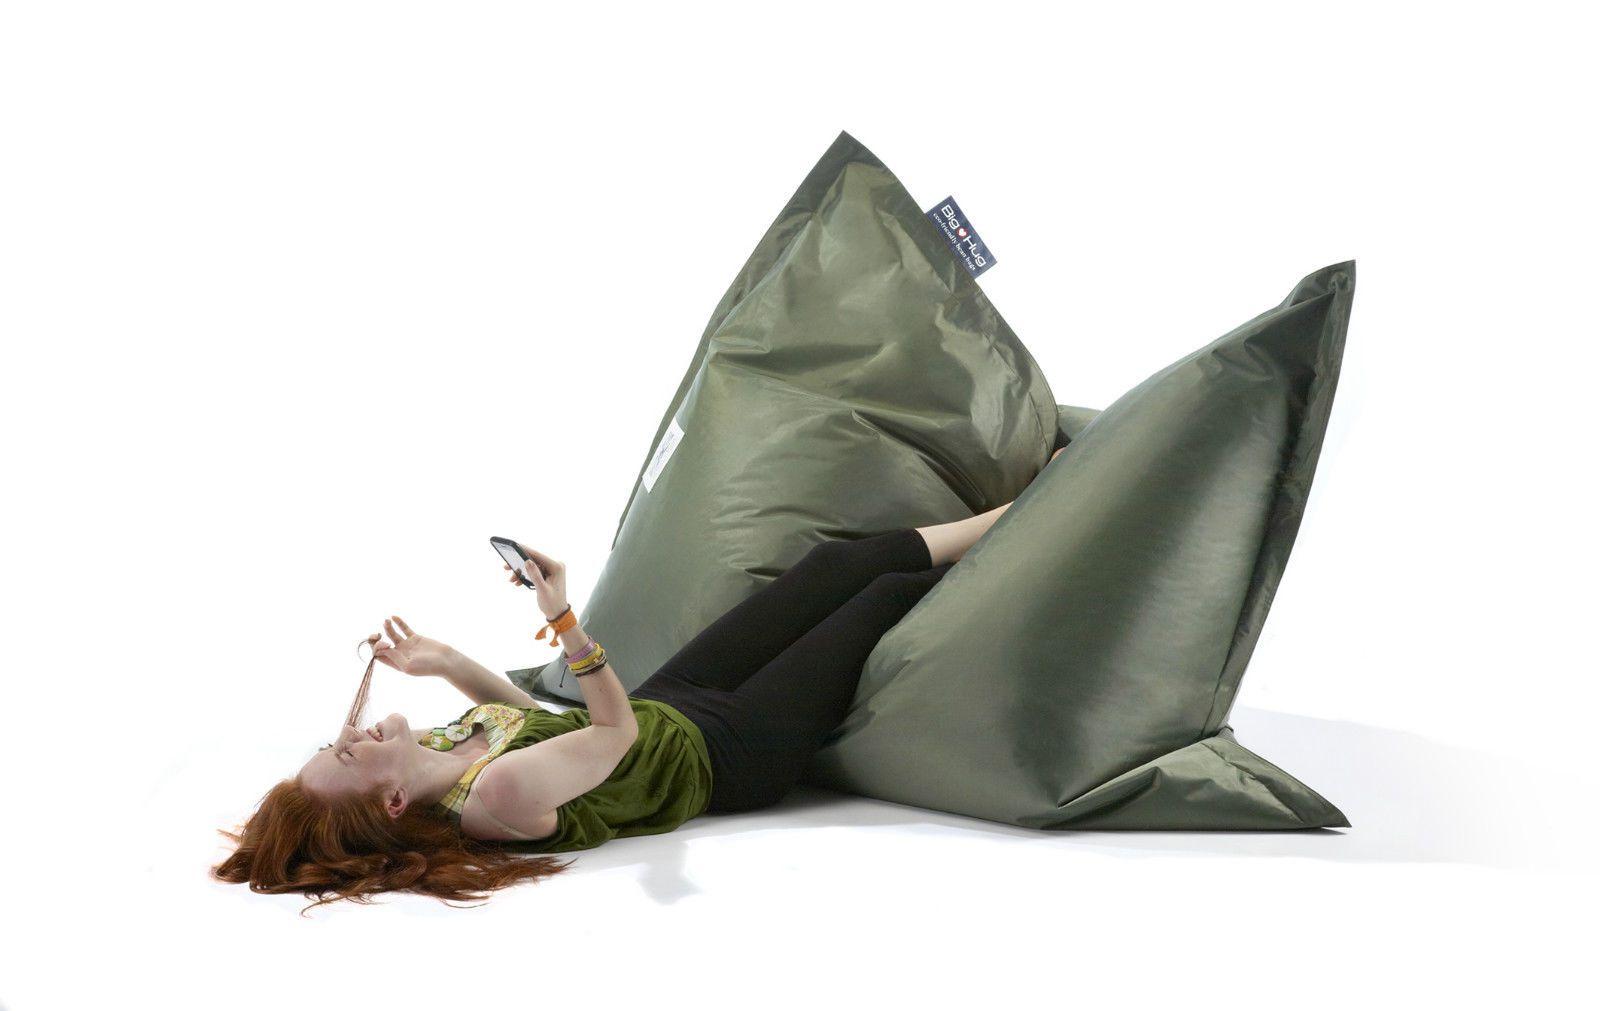 Xxl fullsac amacas beach sofa for Sofas diseno italiano en valencia